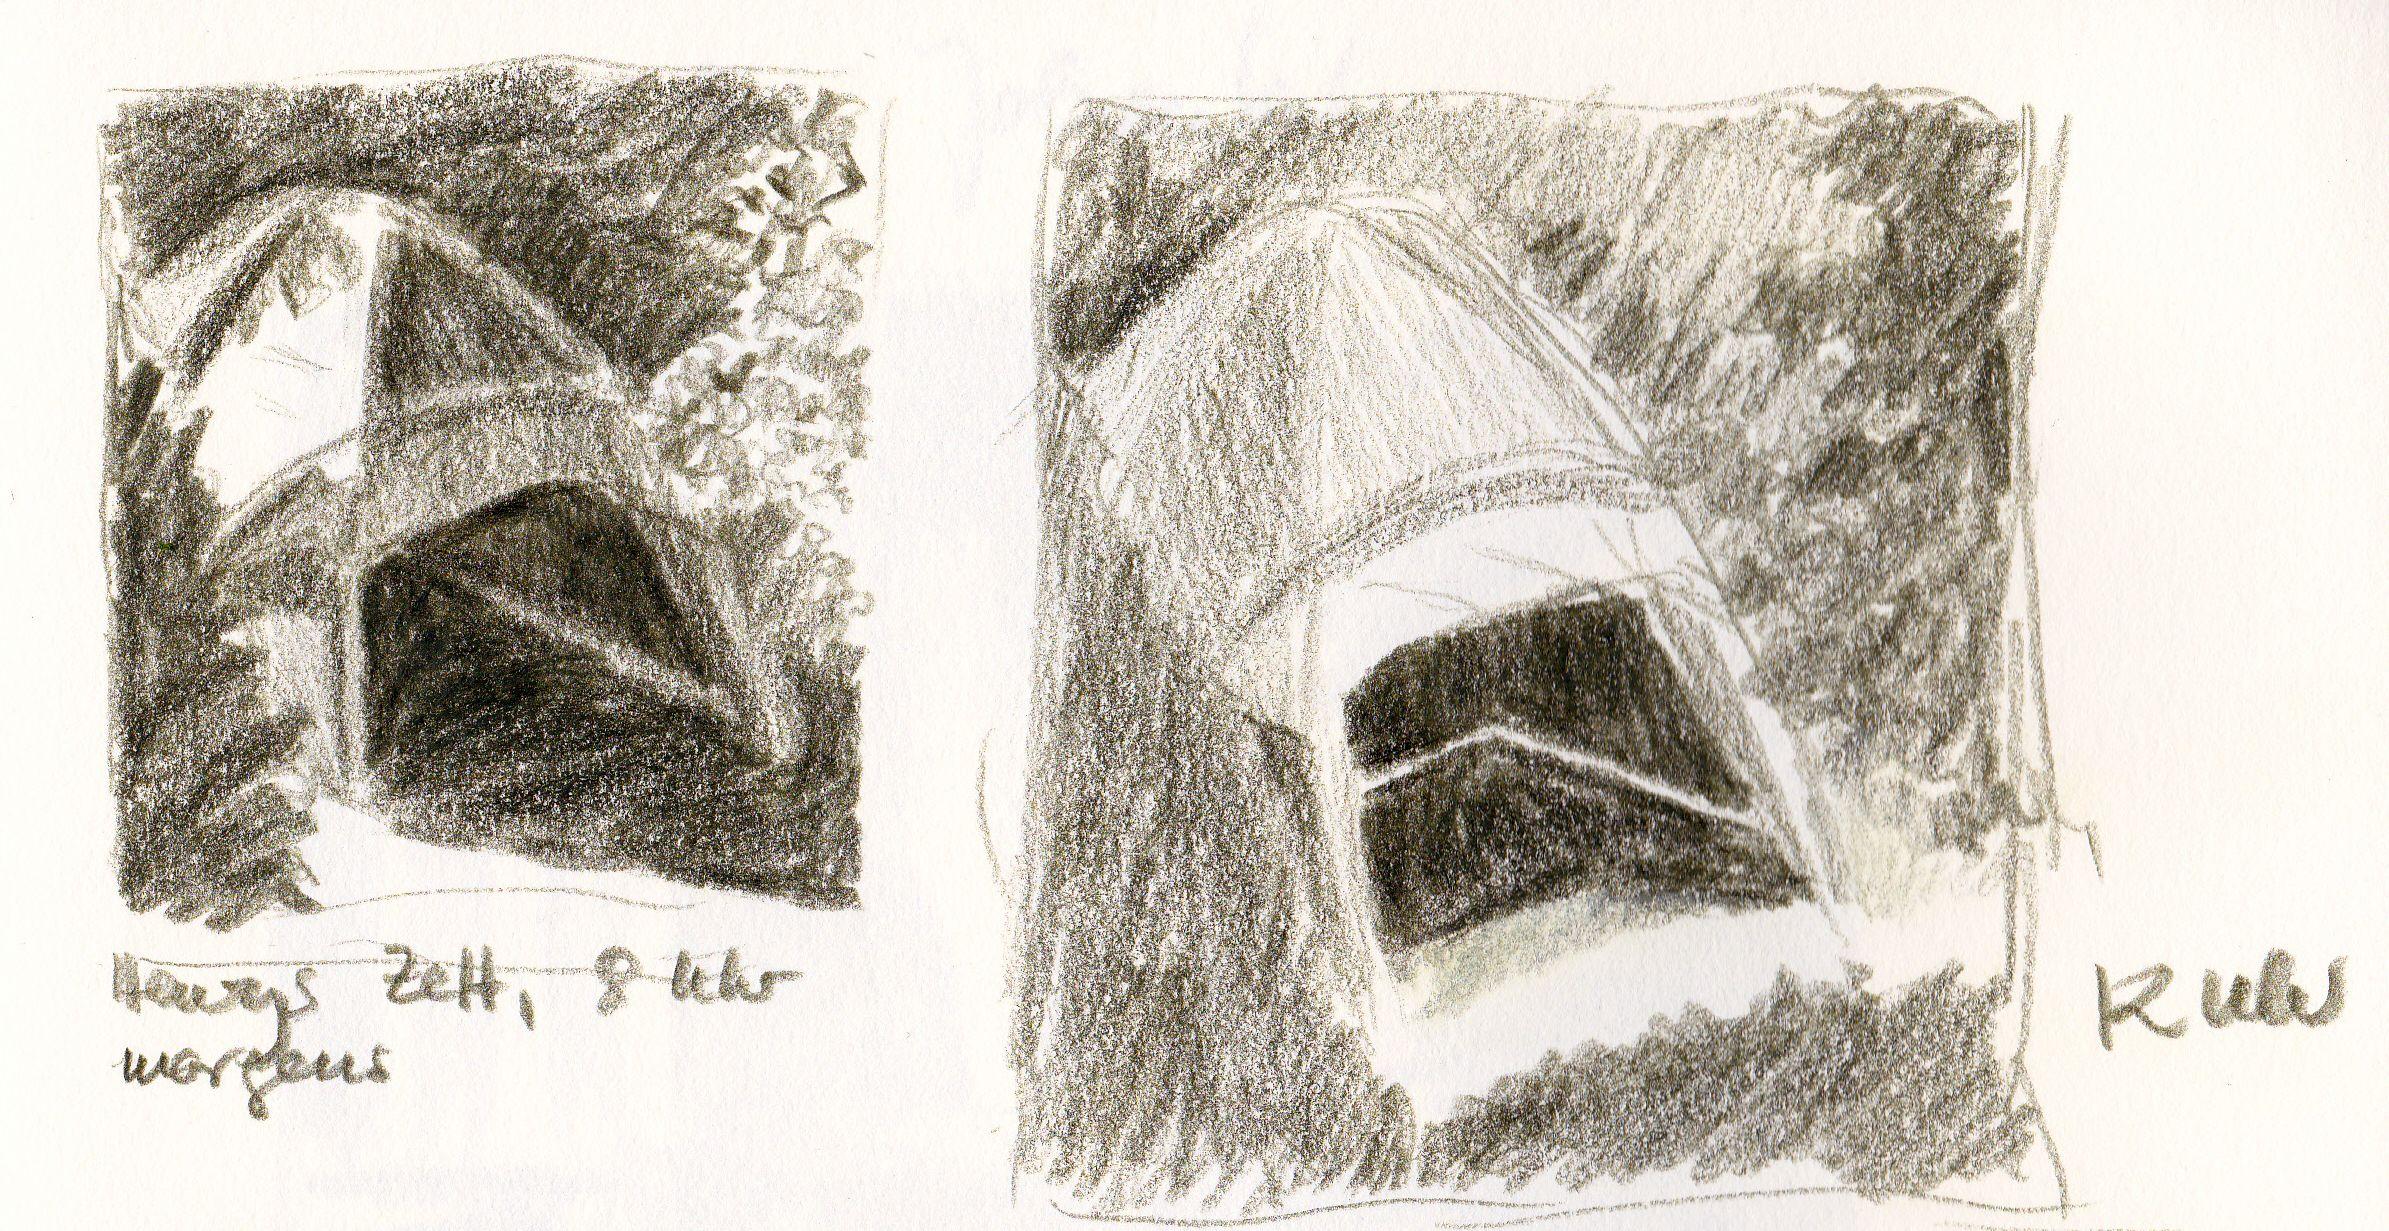 Henrys Zelt/ Henry's tent.